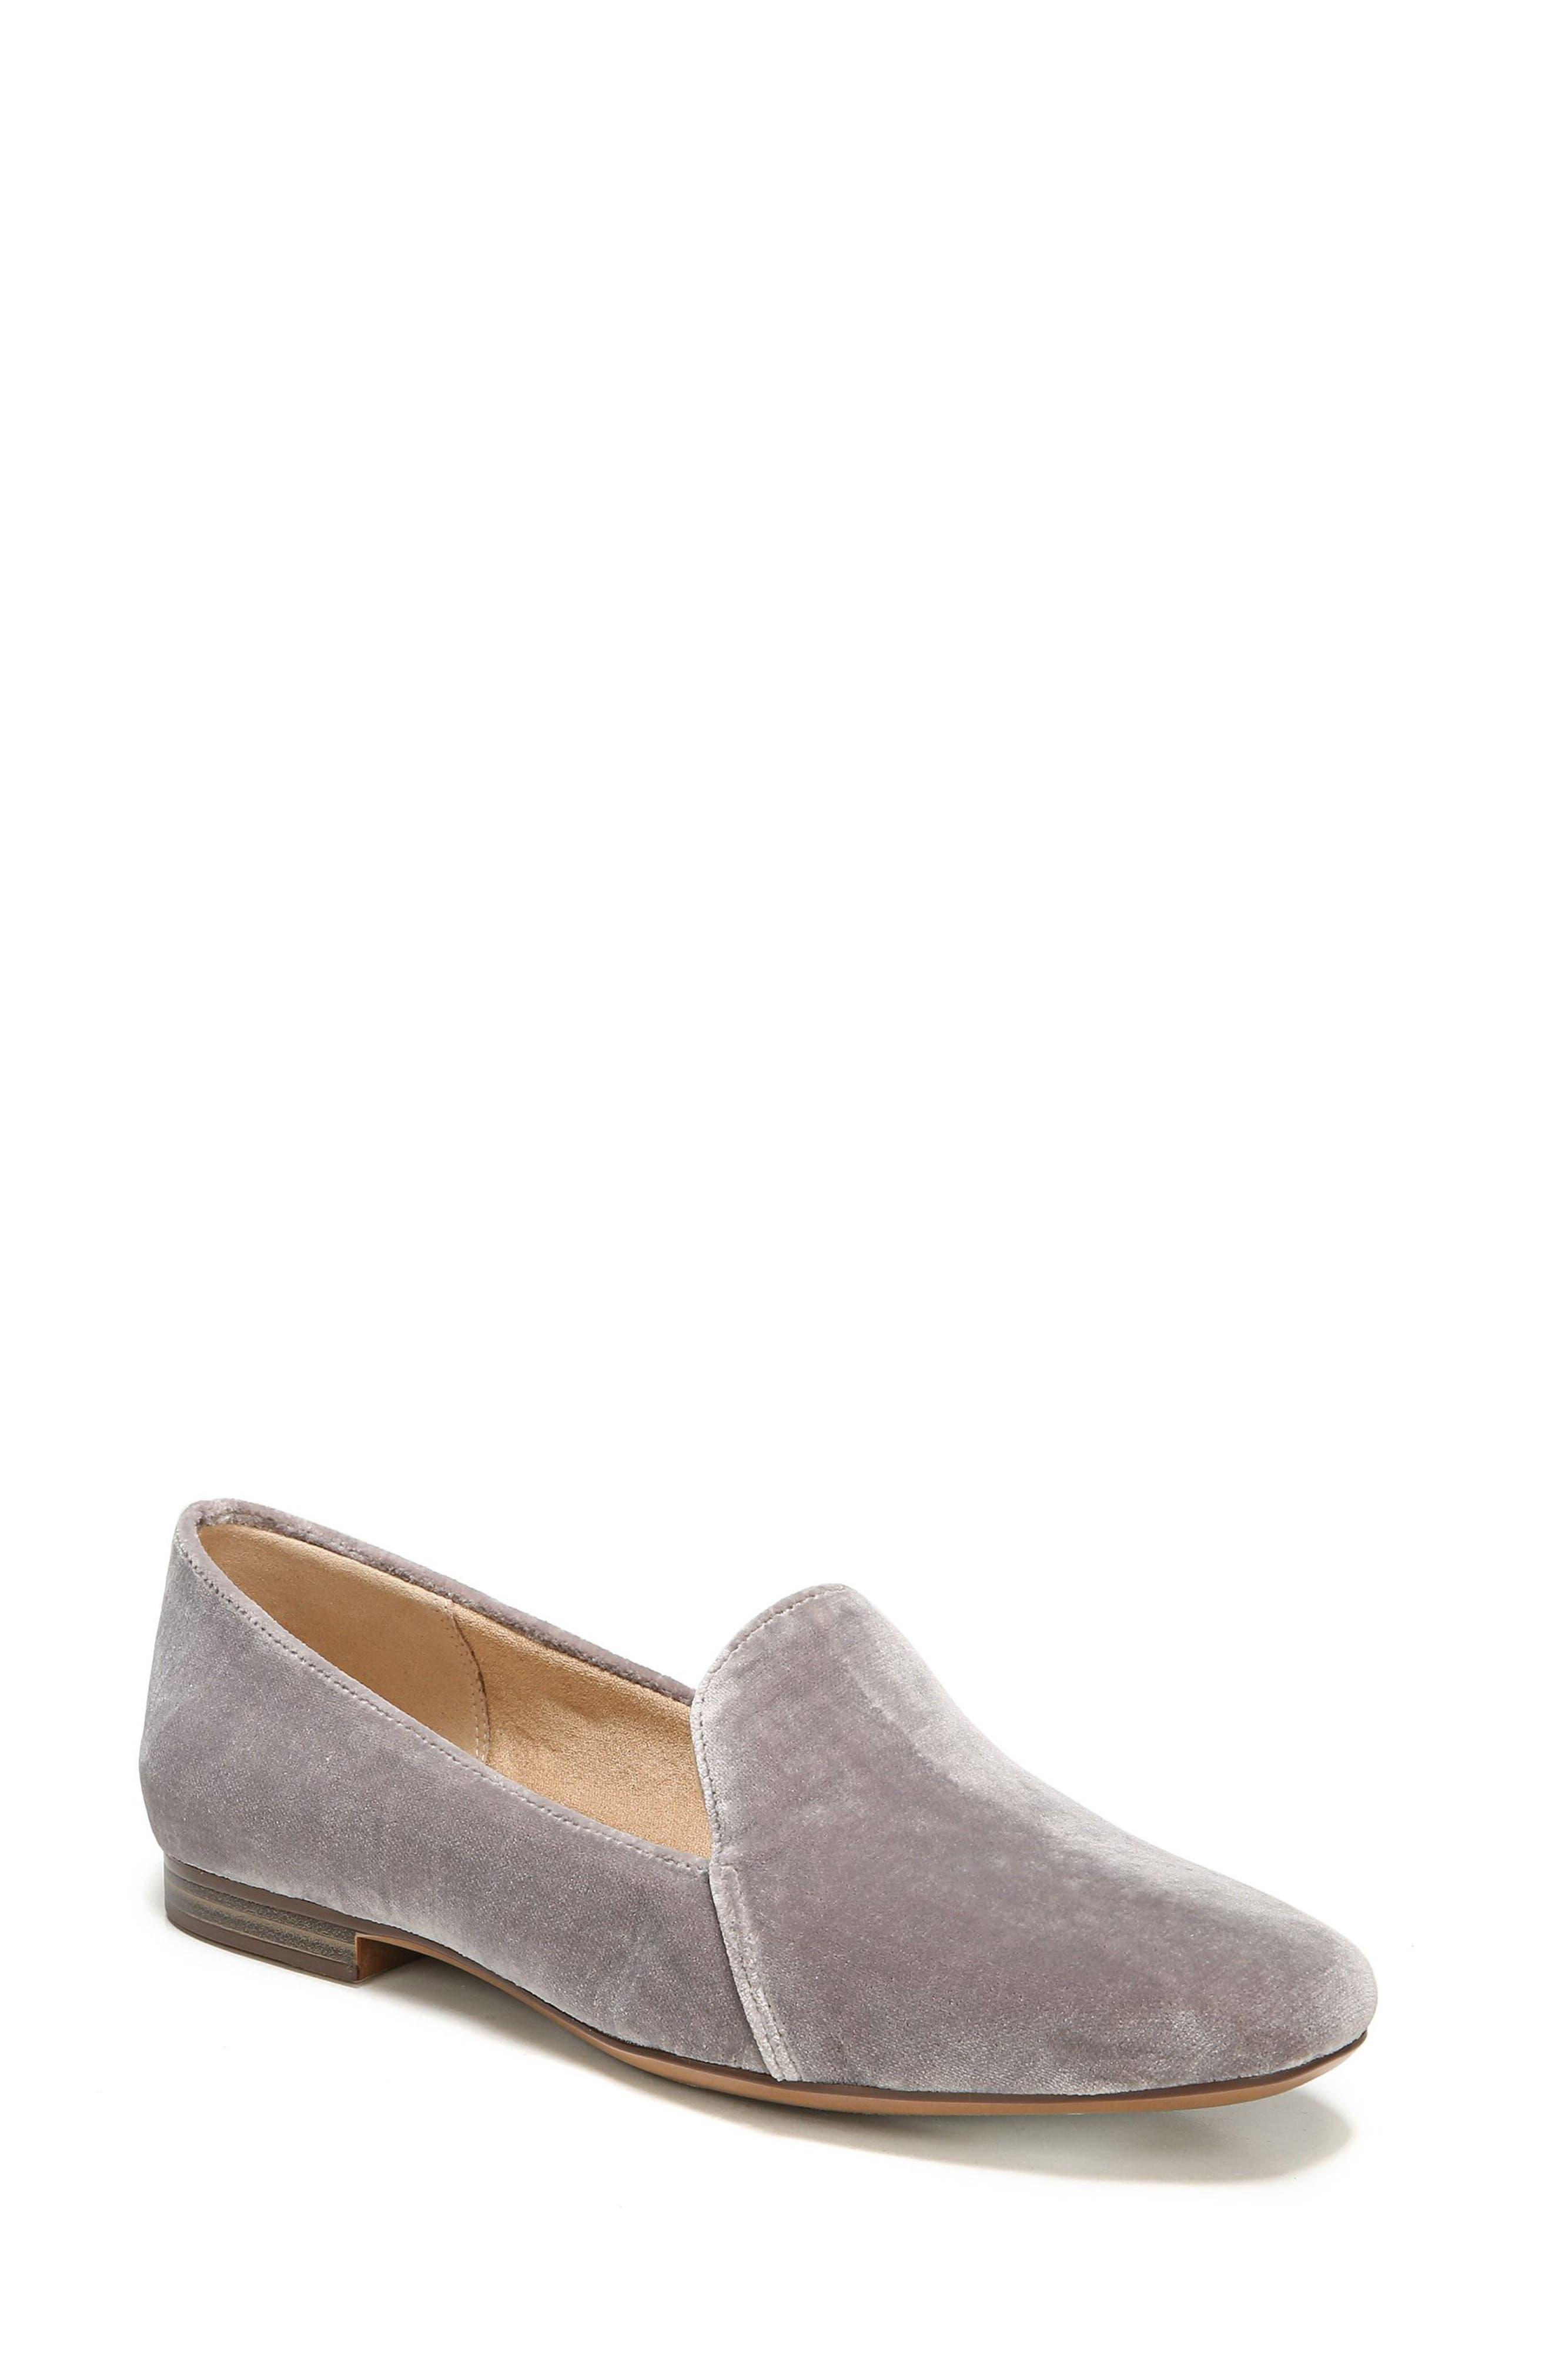 Emiline Flat Loafer,                             Main thumbnail 1, color,                             Taupe Velvet Fabric